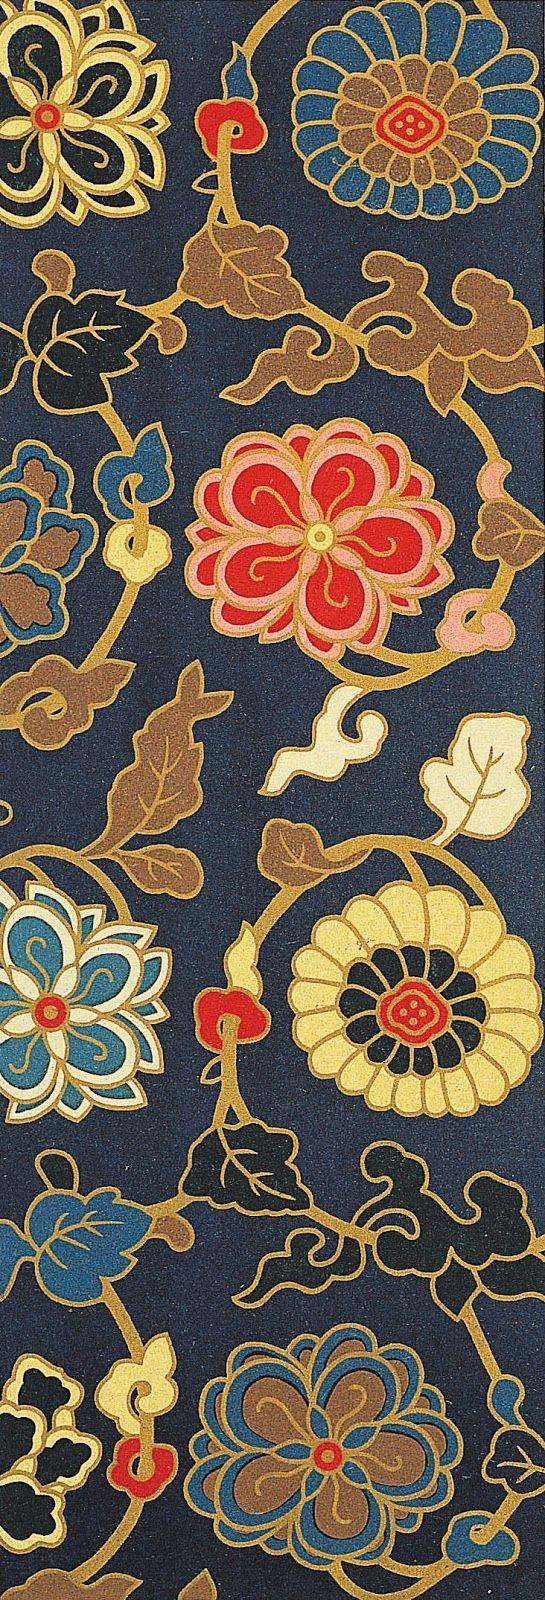 Chinese Motif Patterns 에스닉 패턴, 패턴, 아크릴 아트